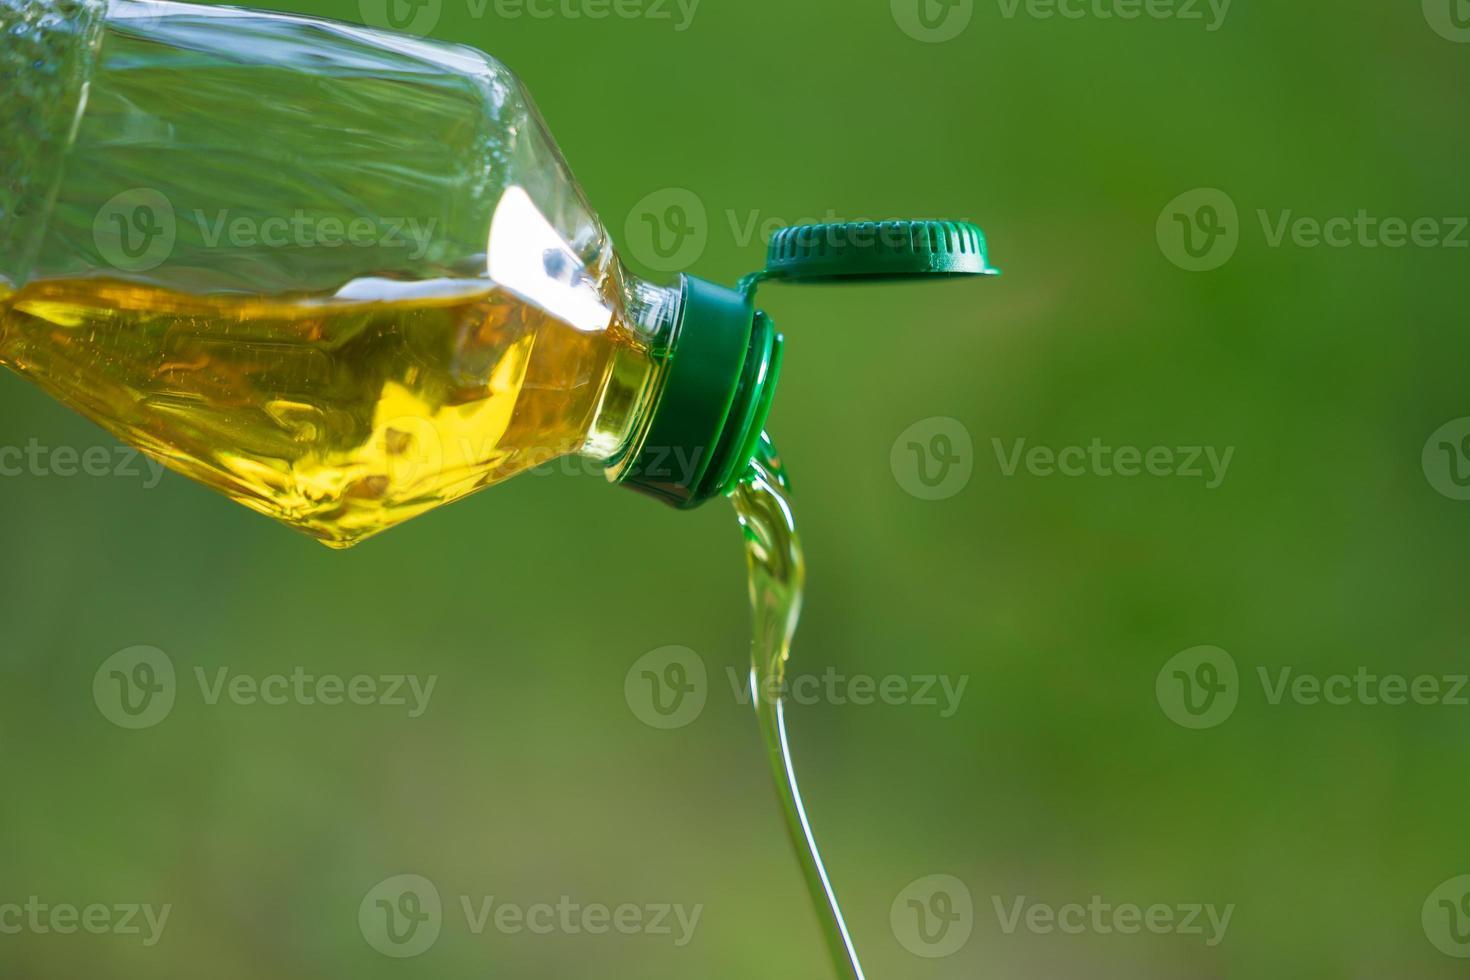 óleo vegetal derramando da garrafa com fundo natural foto